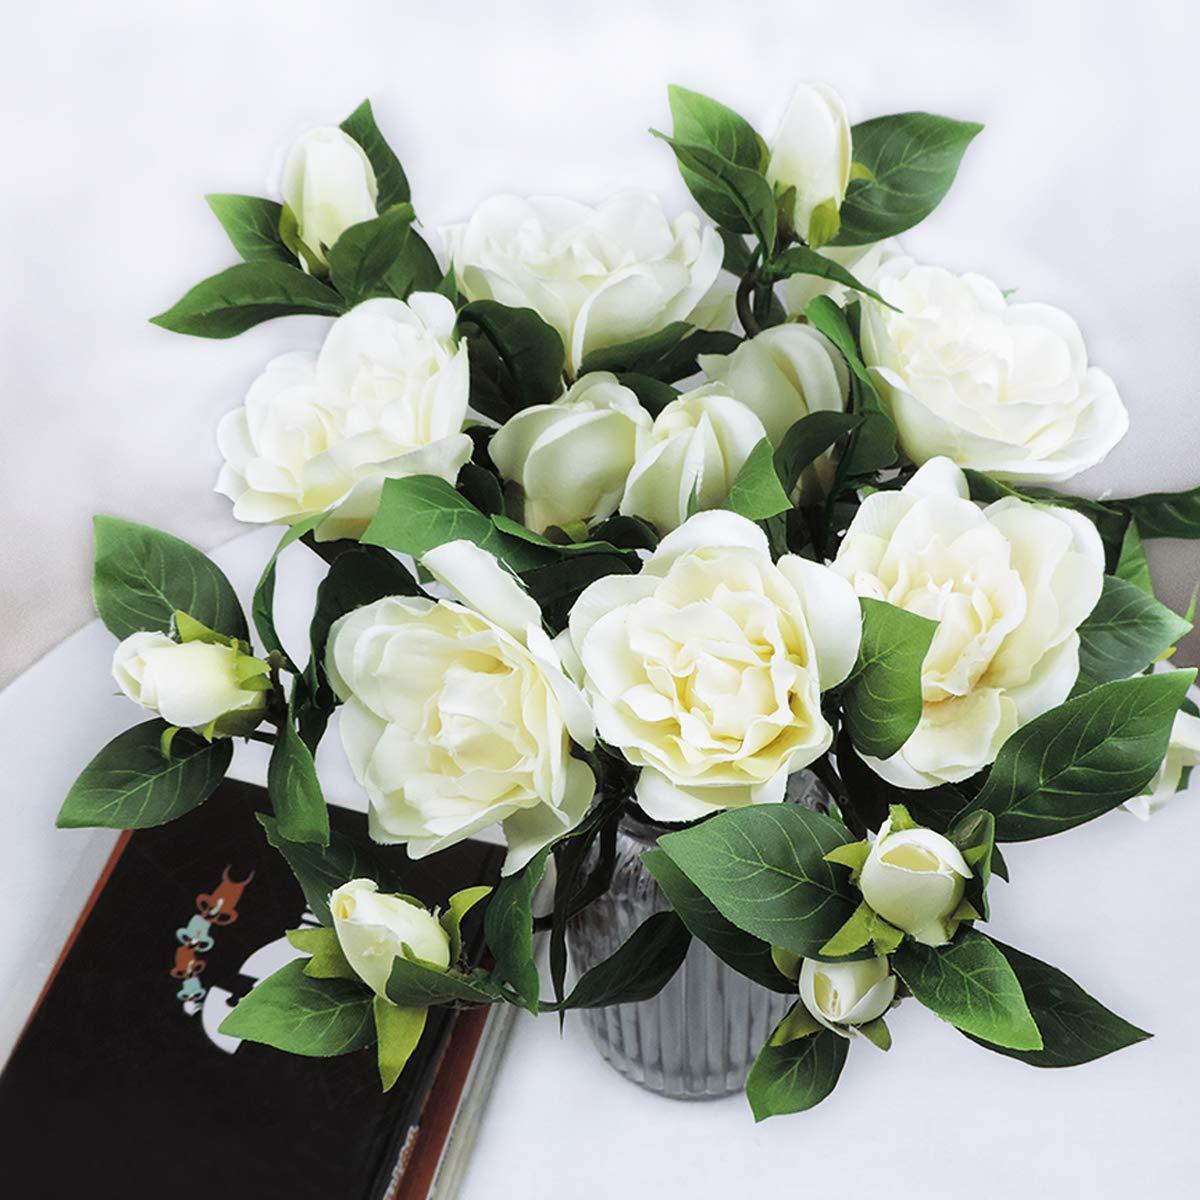 Yinhua 3 Packs Artificial Gardenia Flower Artificial Flower Blooming  Artificial Flower Bouquet for Home Wedding Arrangement Decoration (White,  Pack